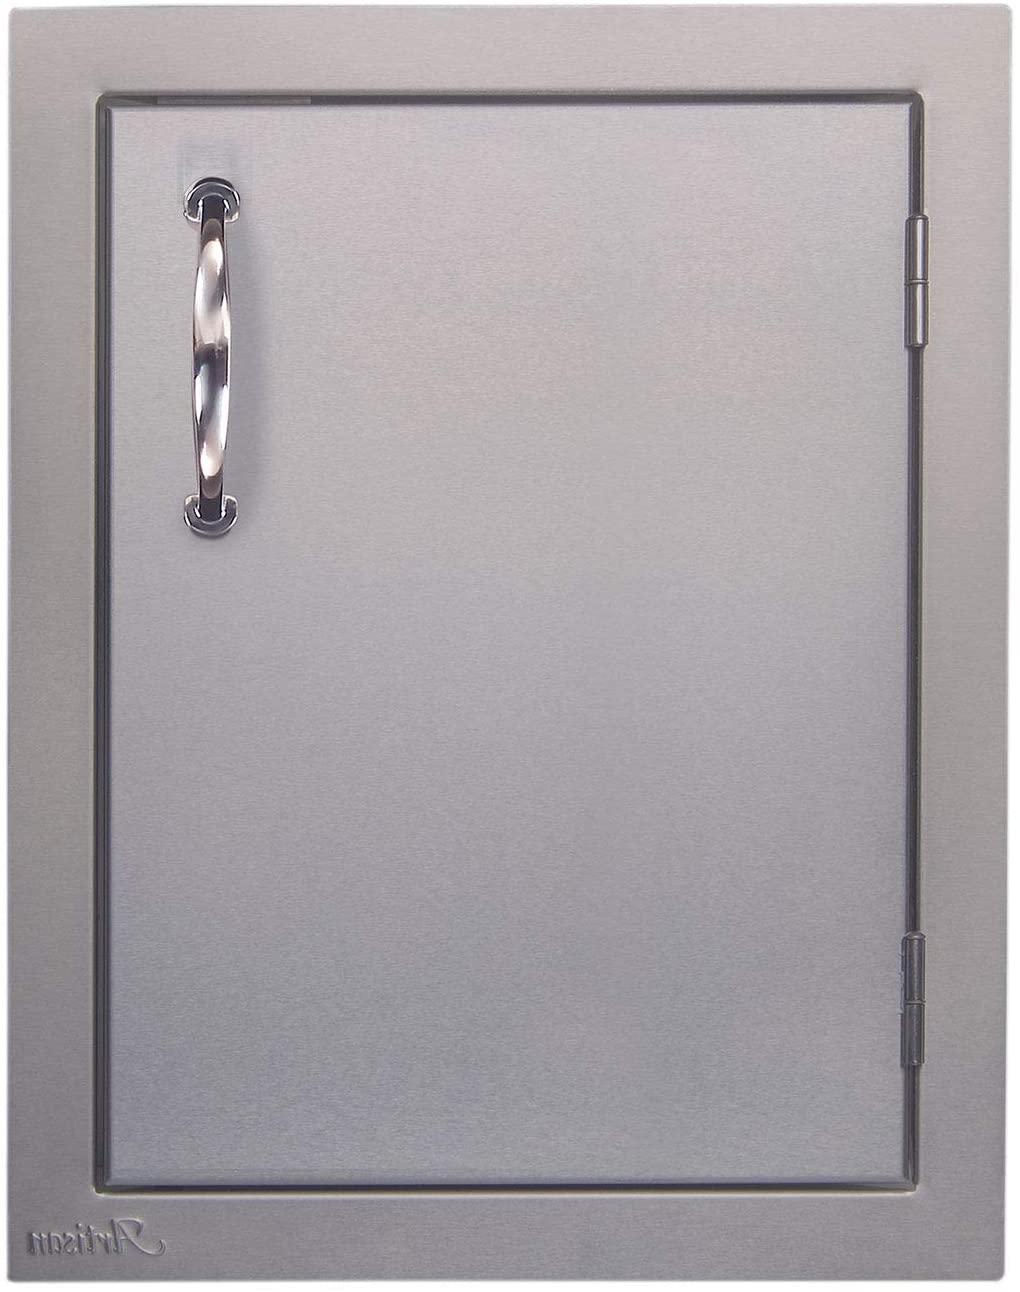 Artisan Right Hinged Single Access Door, 17-Inch (ARTP-17DR)